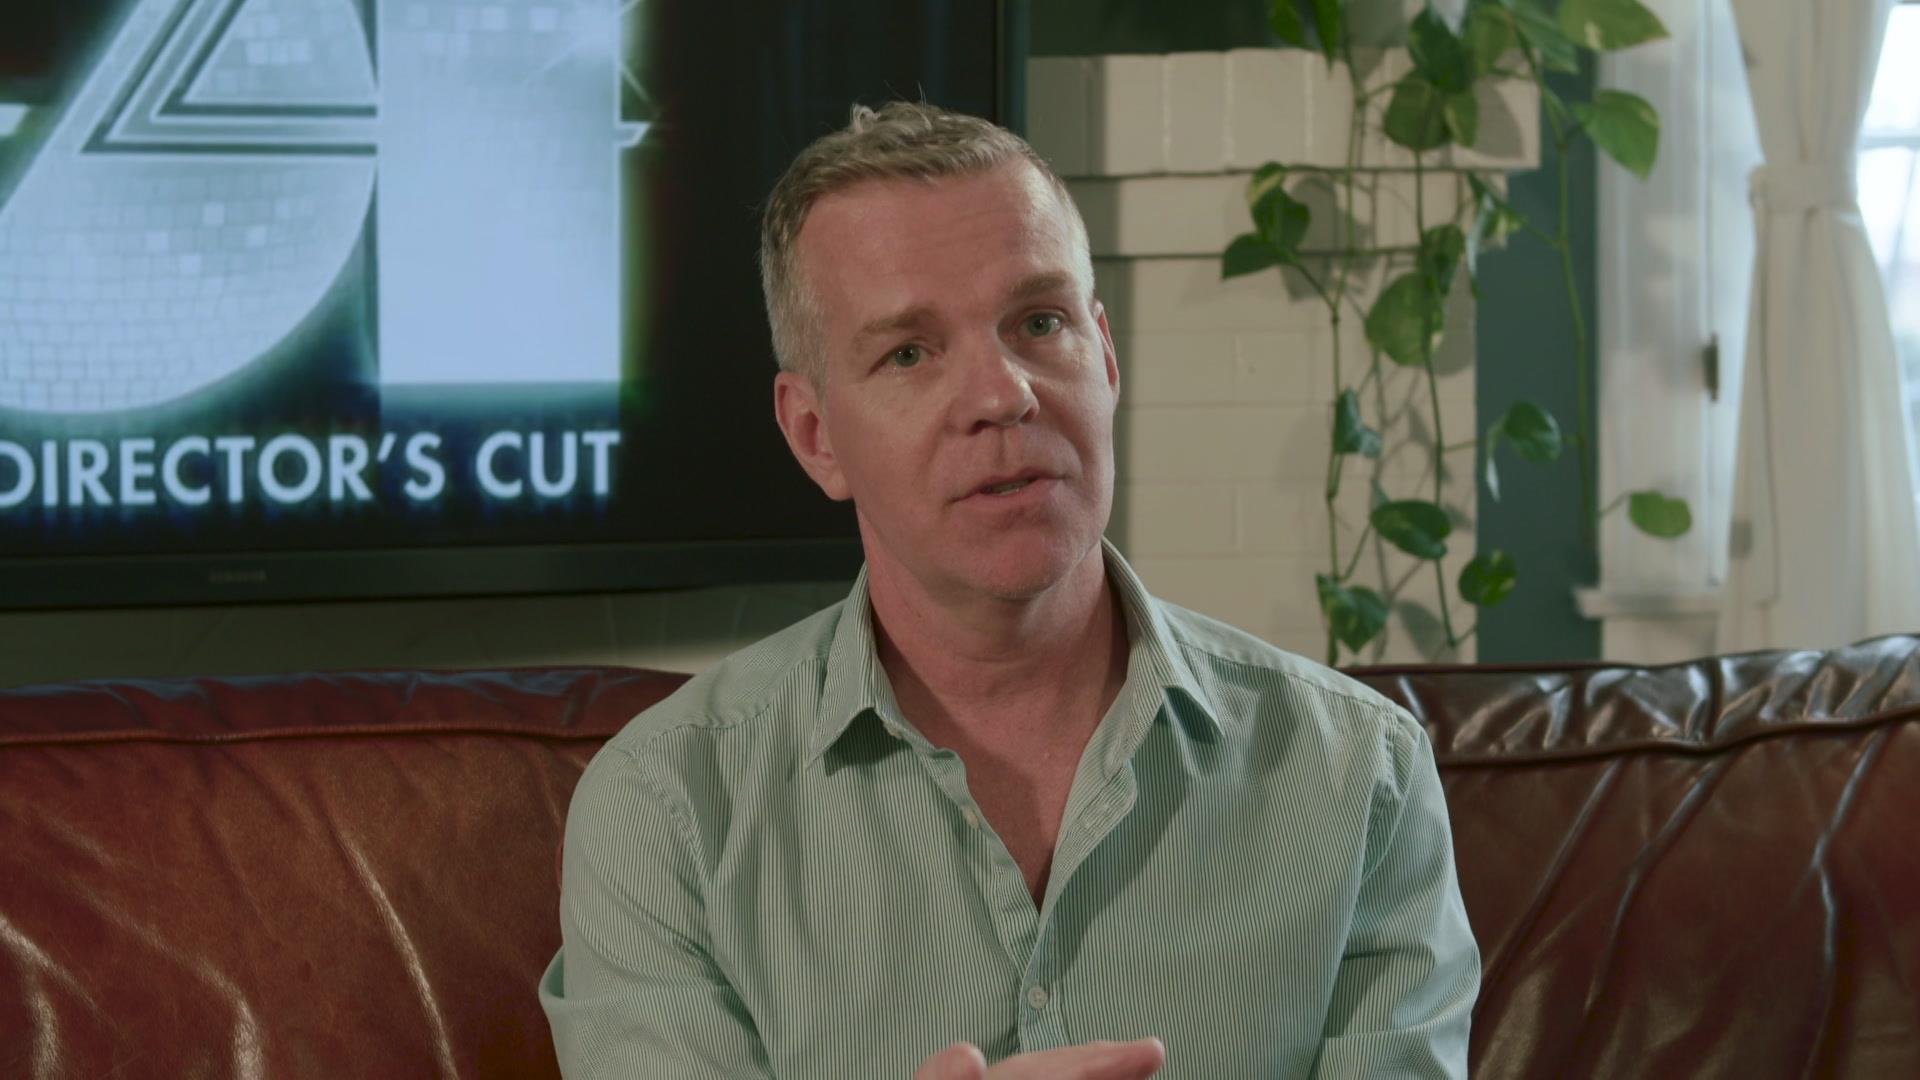 54: The Director's Cut - Blu-ray Featurette Clip